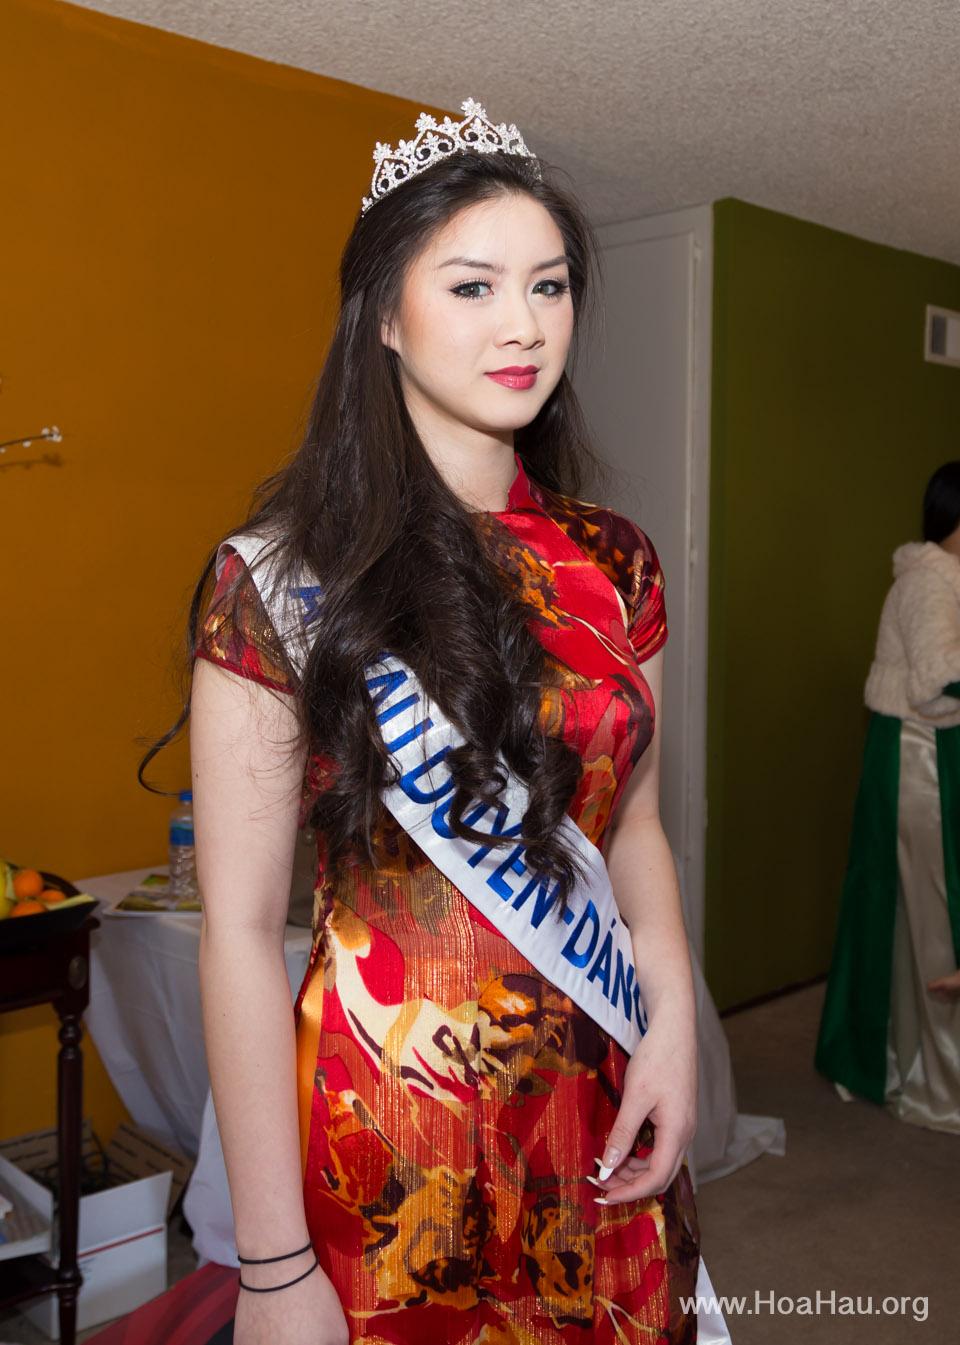 Tet Festival 2014 at Vietnam Town - Hoa Hau - Miss Vietnam - Image 105